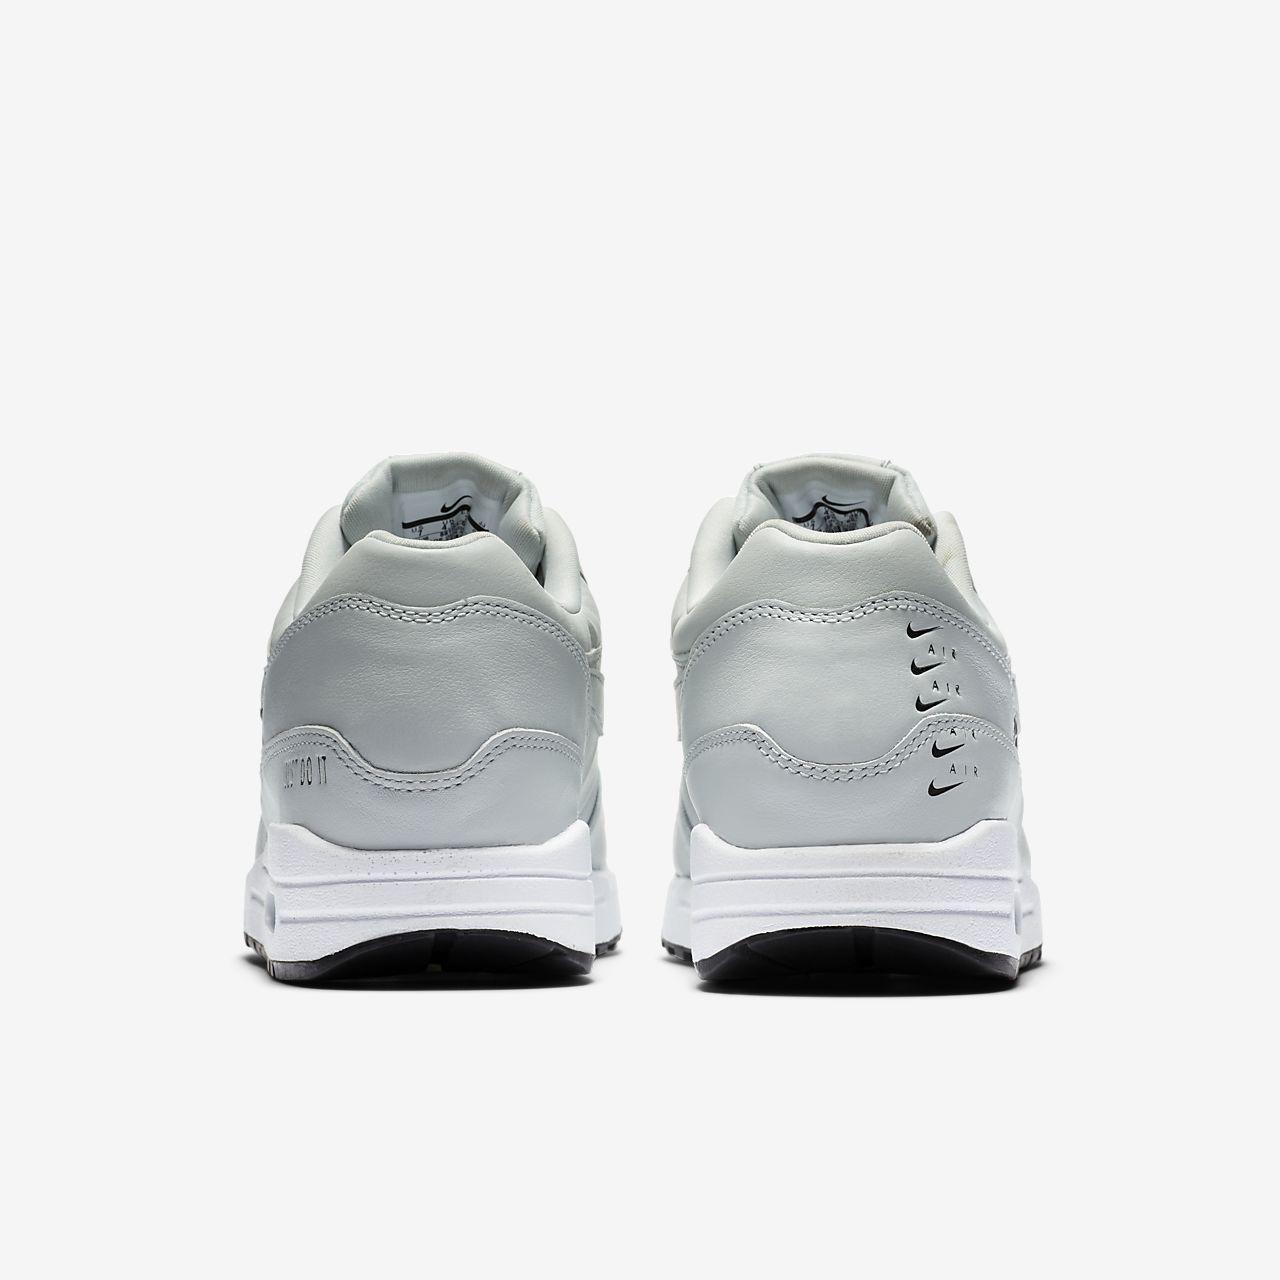 quality design d06c2 dda99 ... Chaussure Nike Air Max 1 SE pour Femme